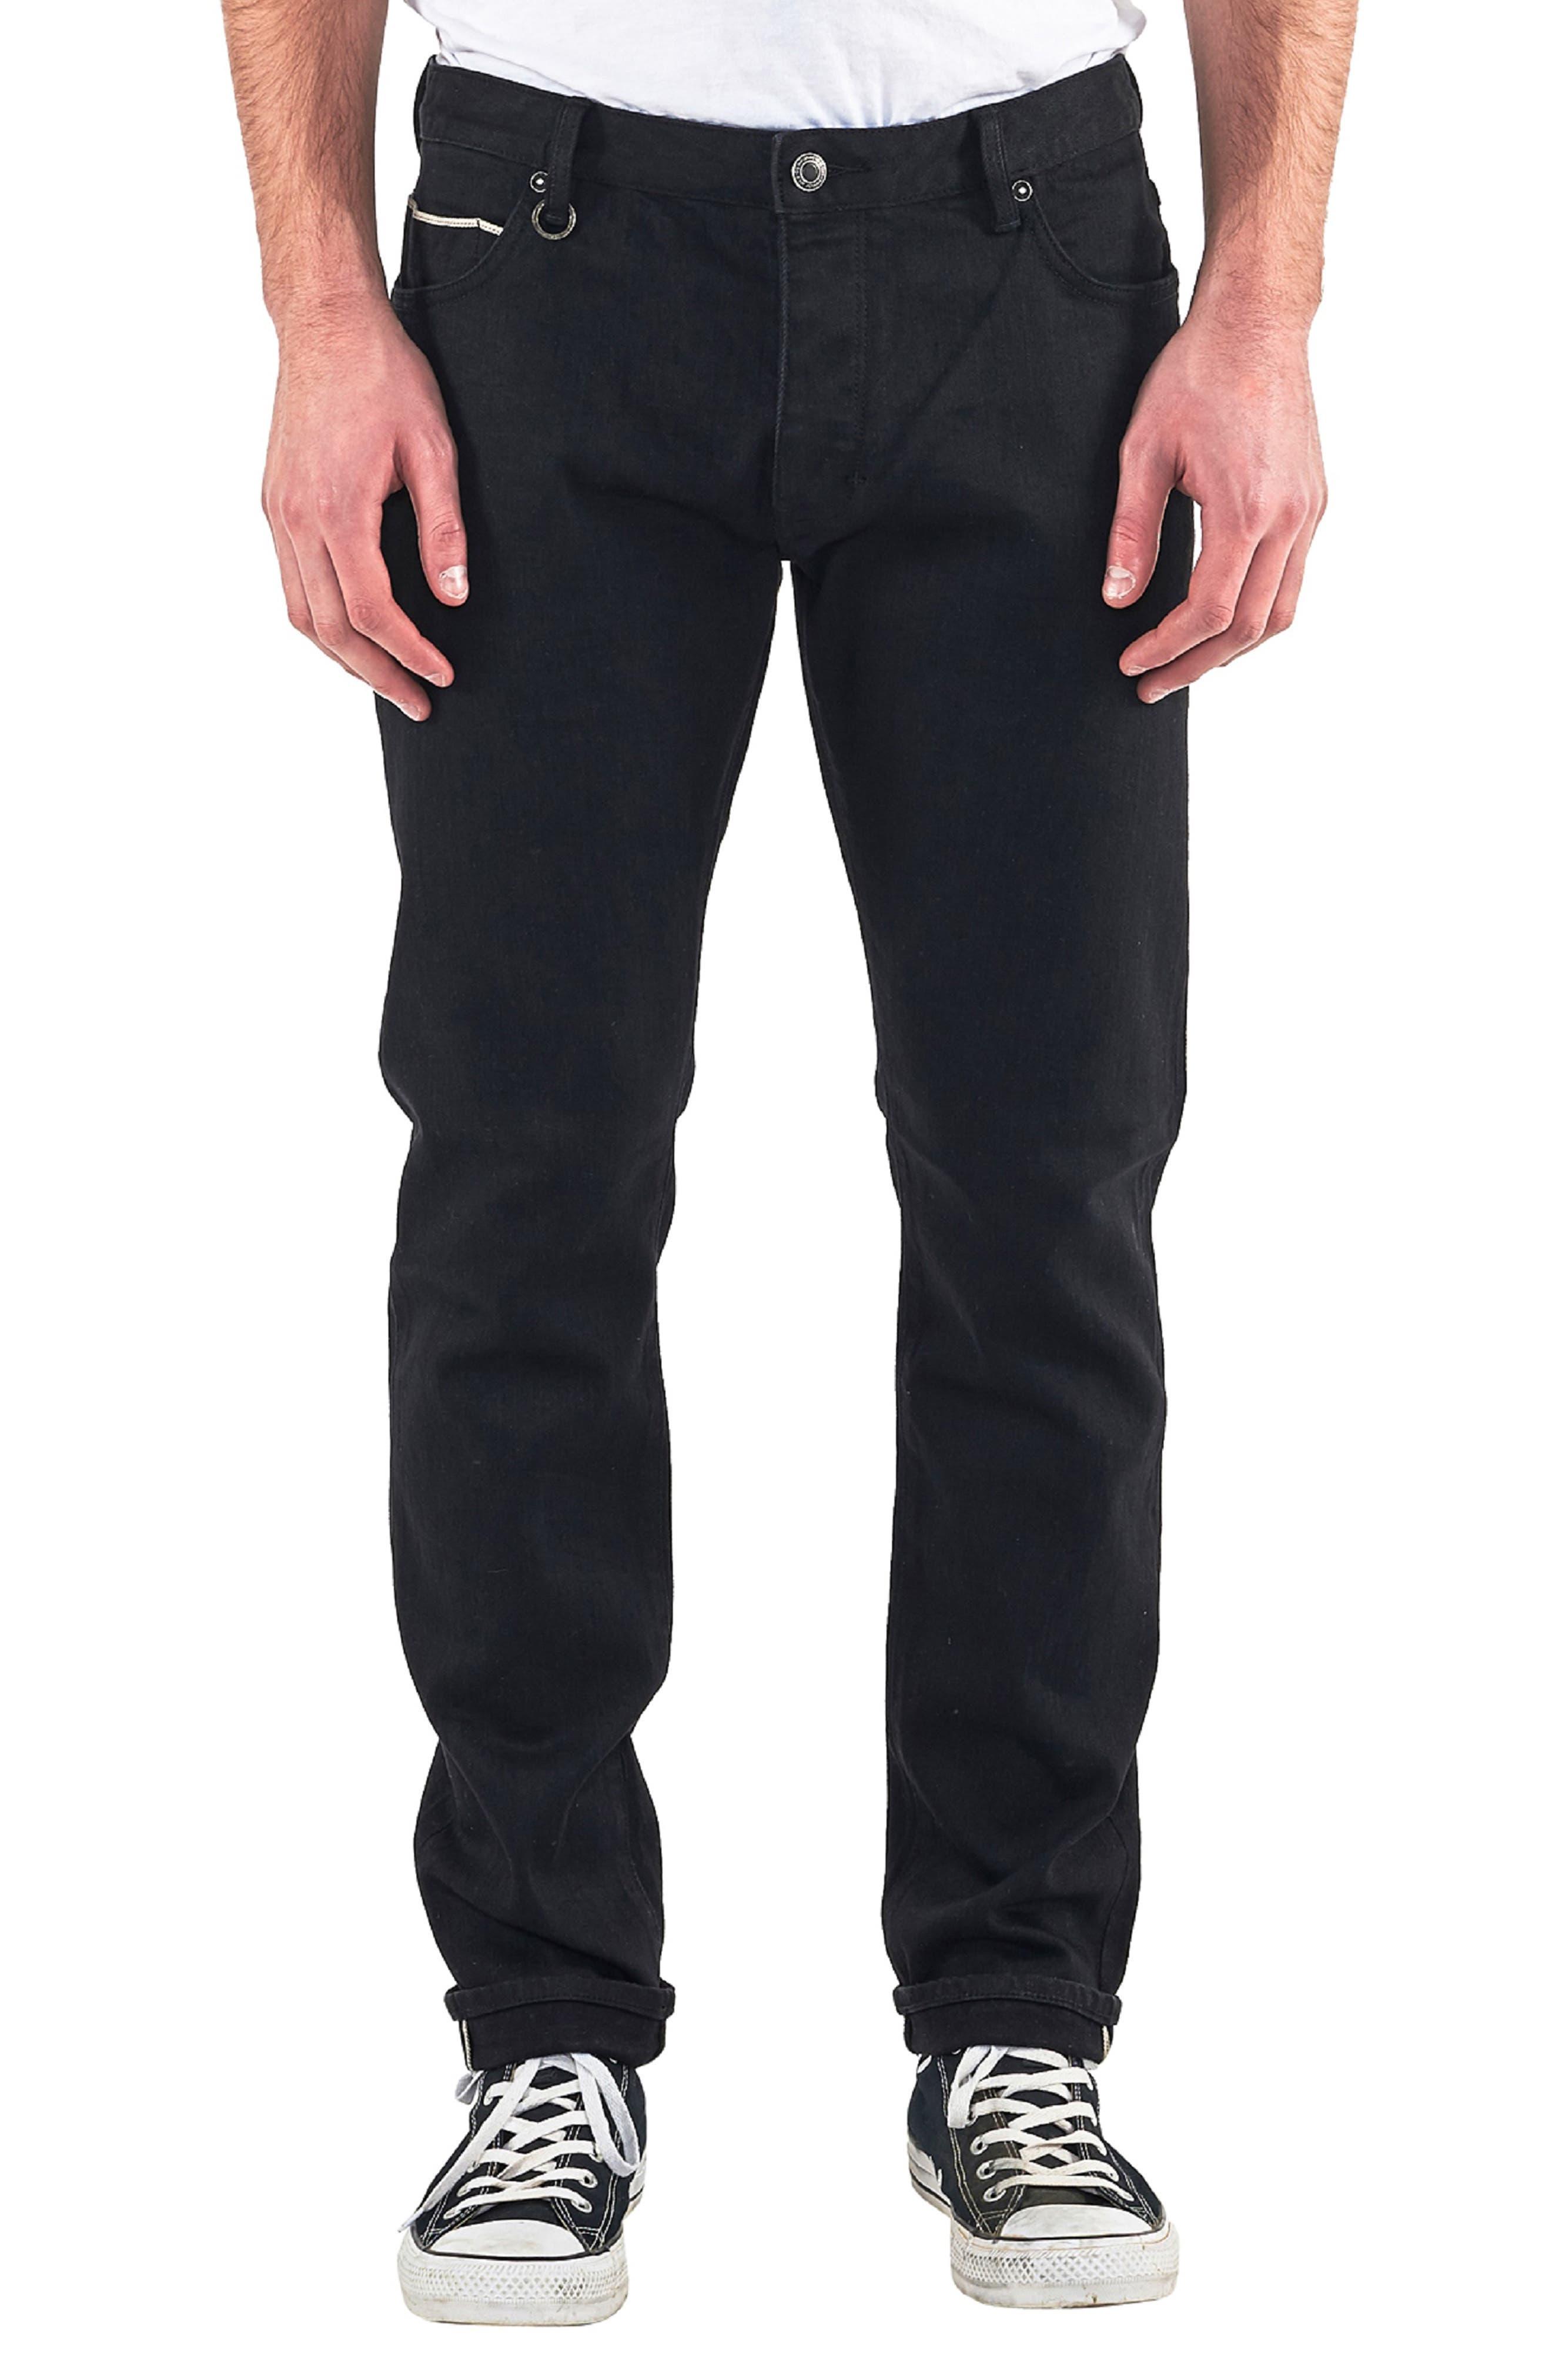 Lou Slim Fit Jeans,                             Main thumbnail 1, color,                             BLACK SELVEDGE